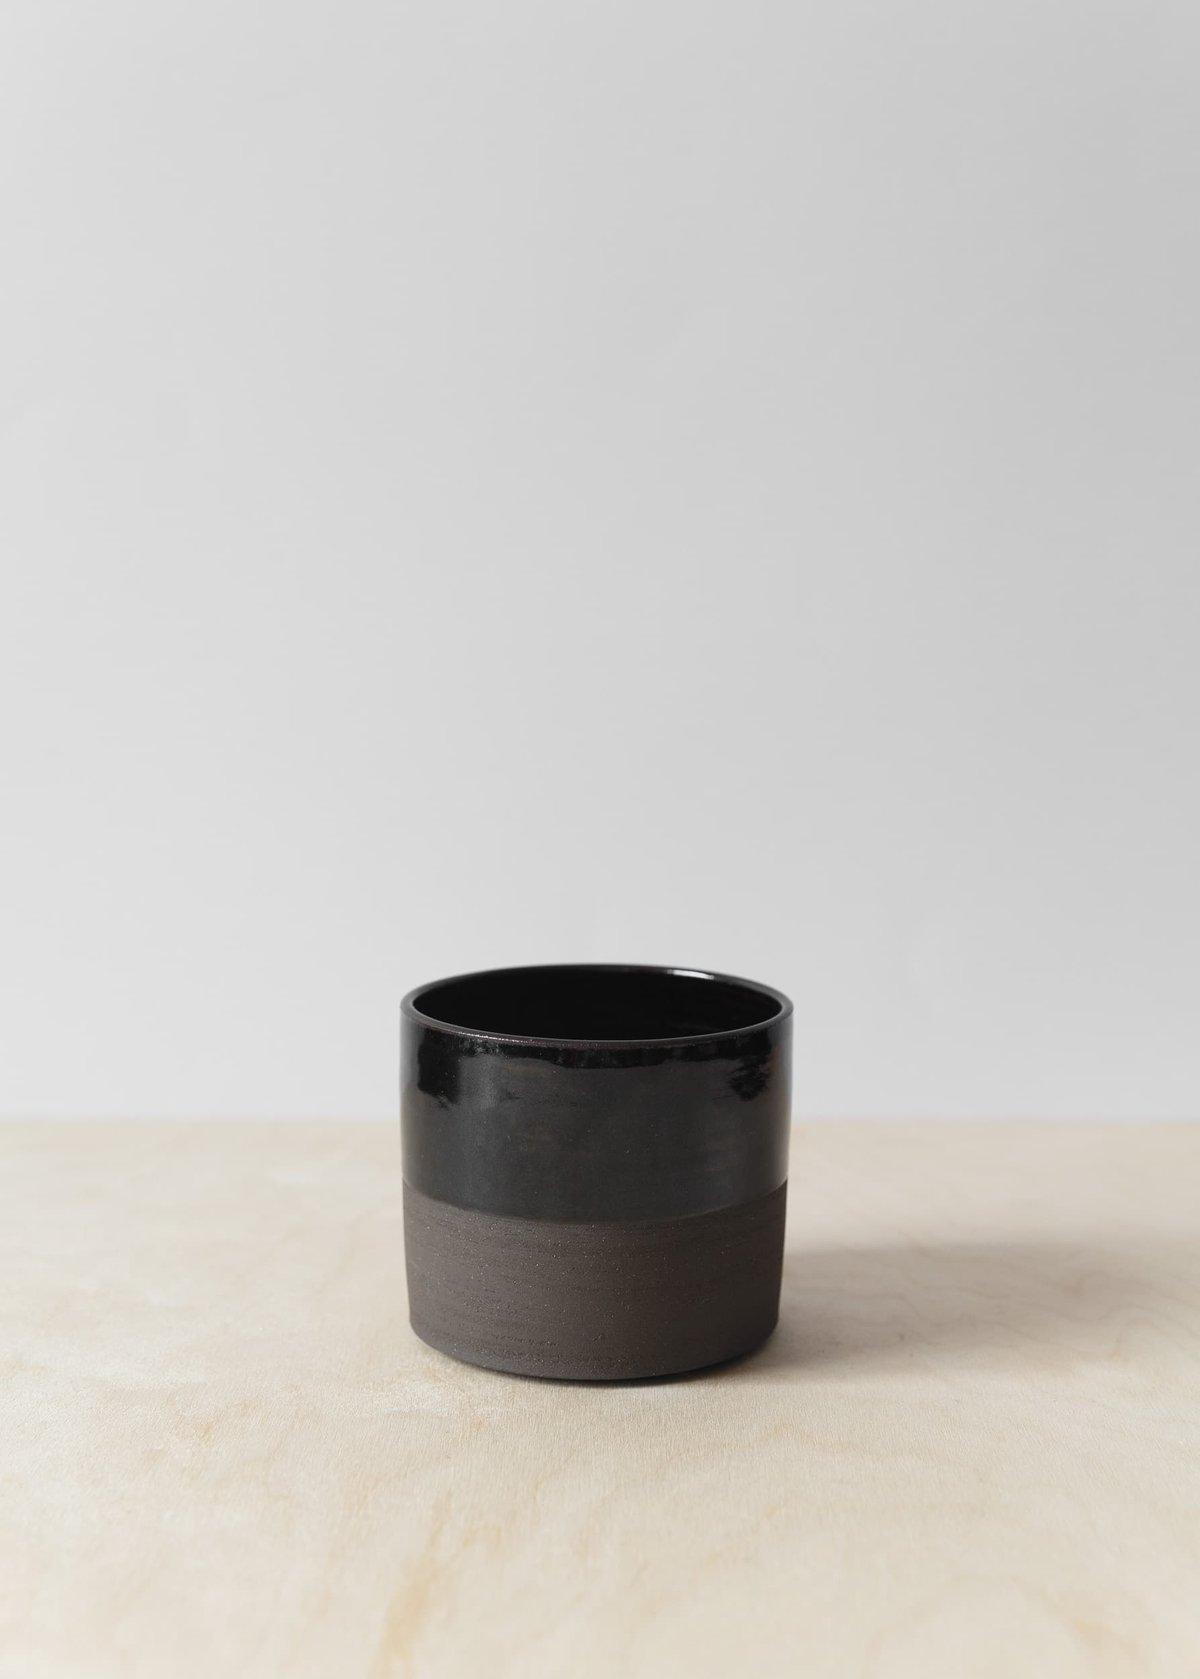 Image of Charcoal midi pot